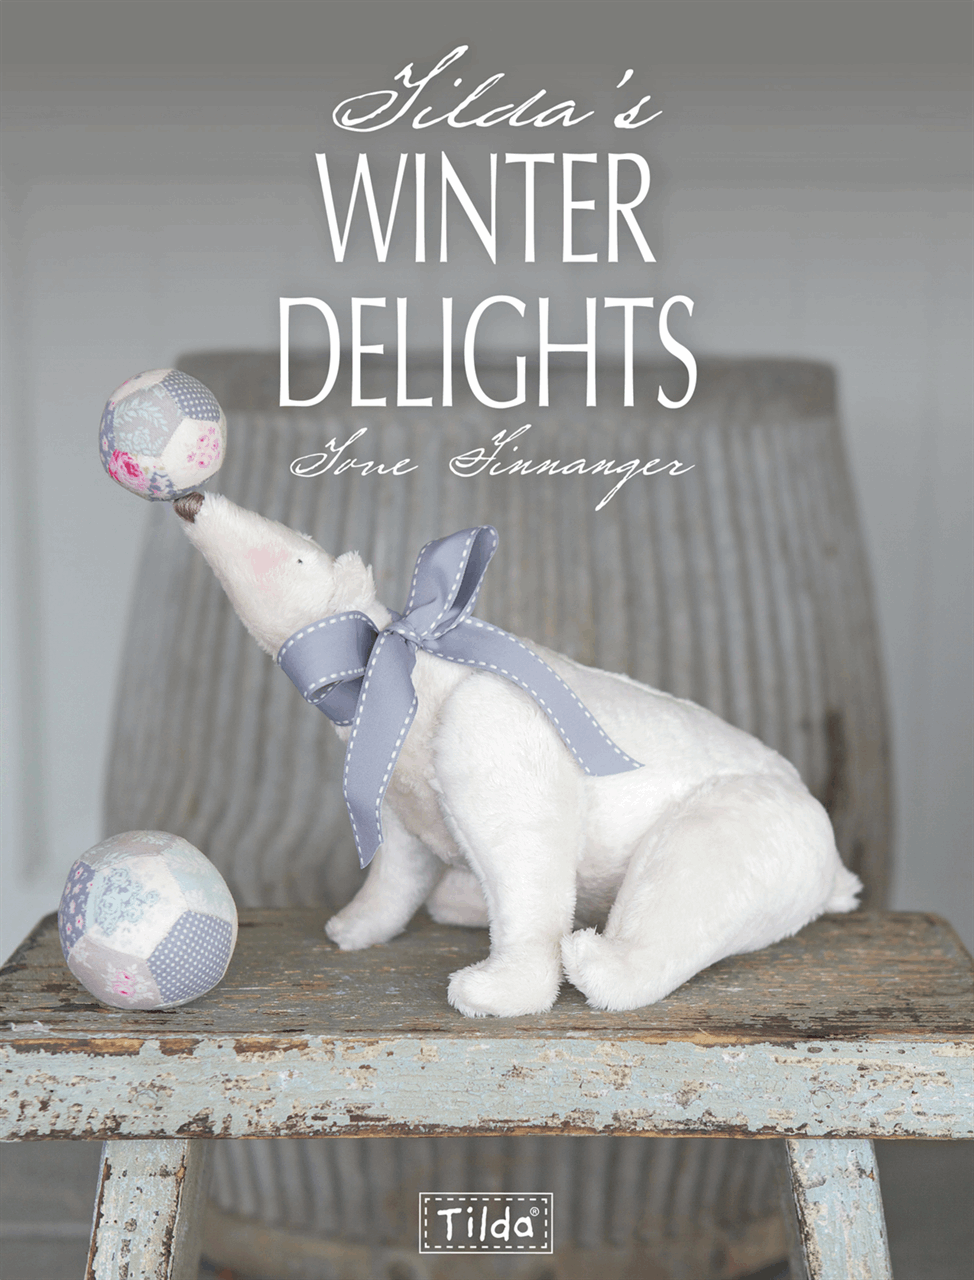 Tilda Winter Delights Book